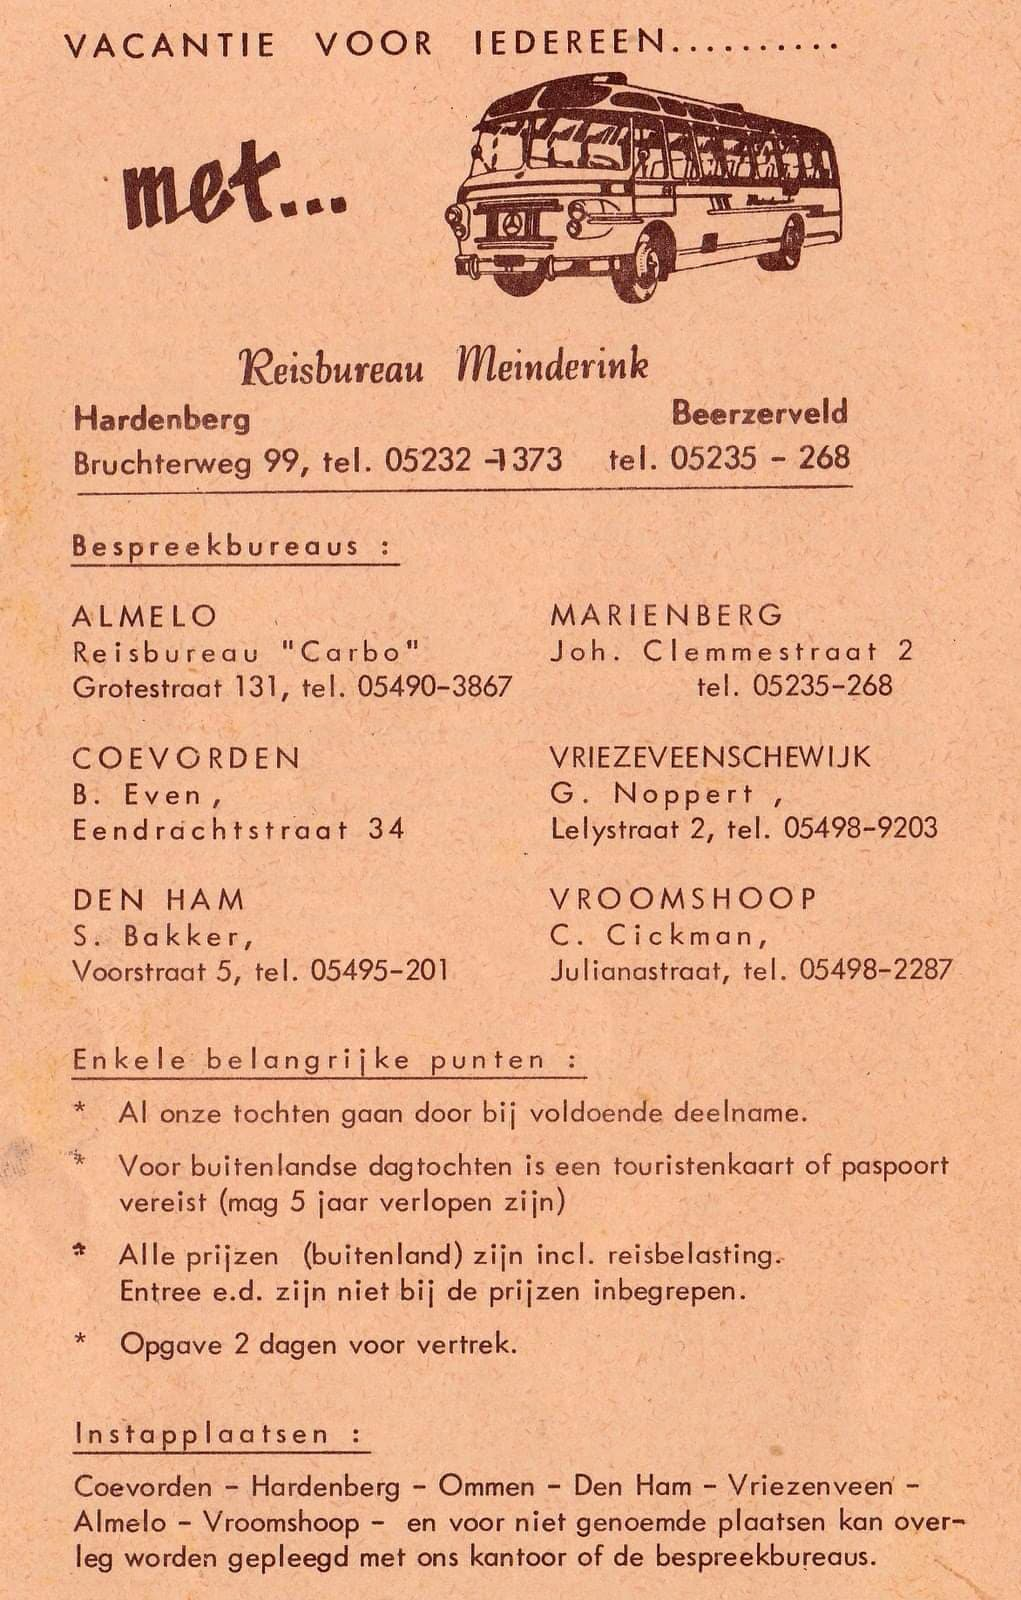 archief-Siegfriet-Kamphuis-(2)